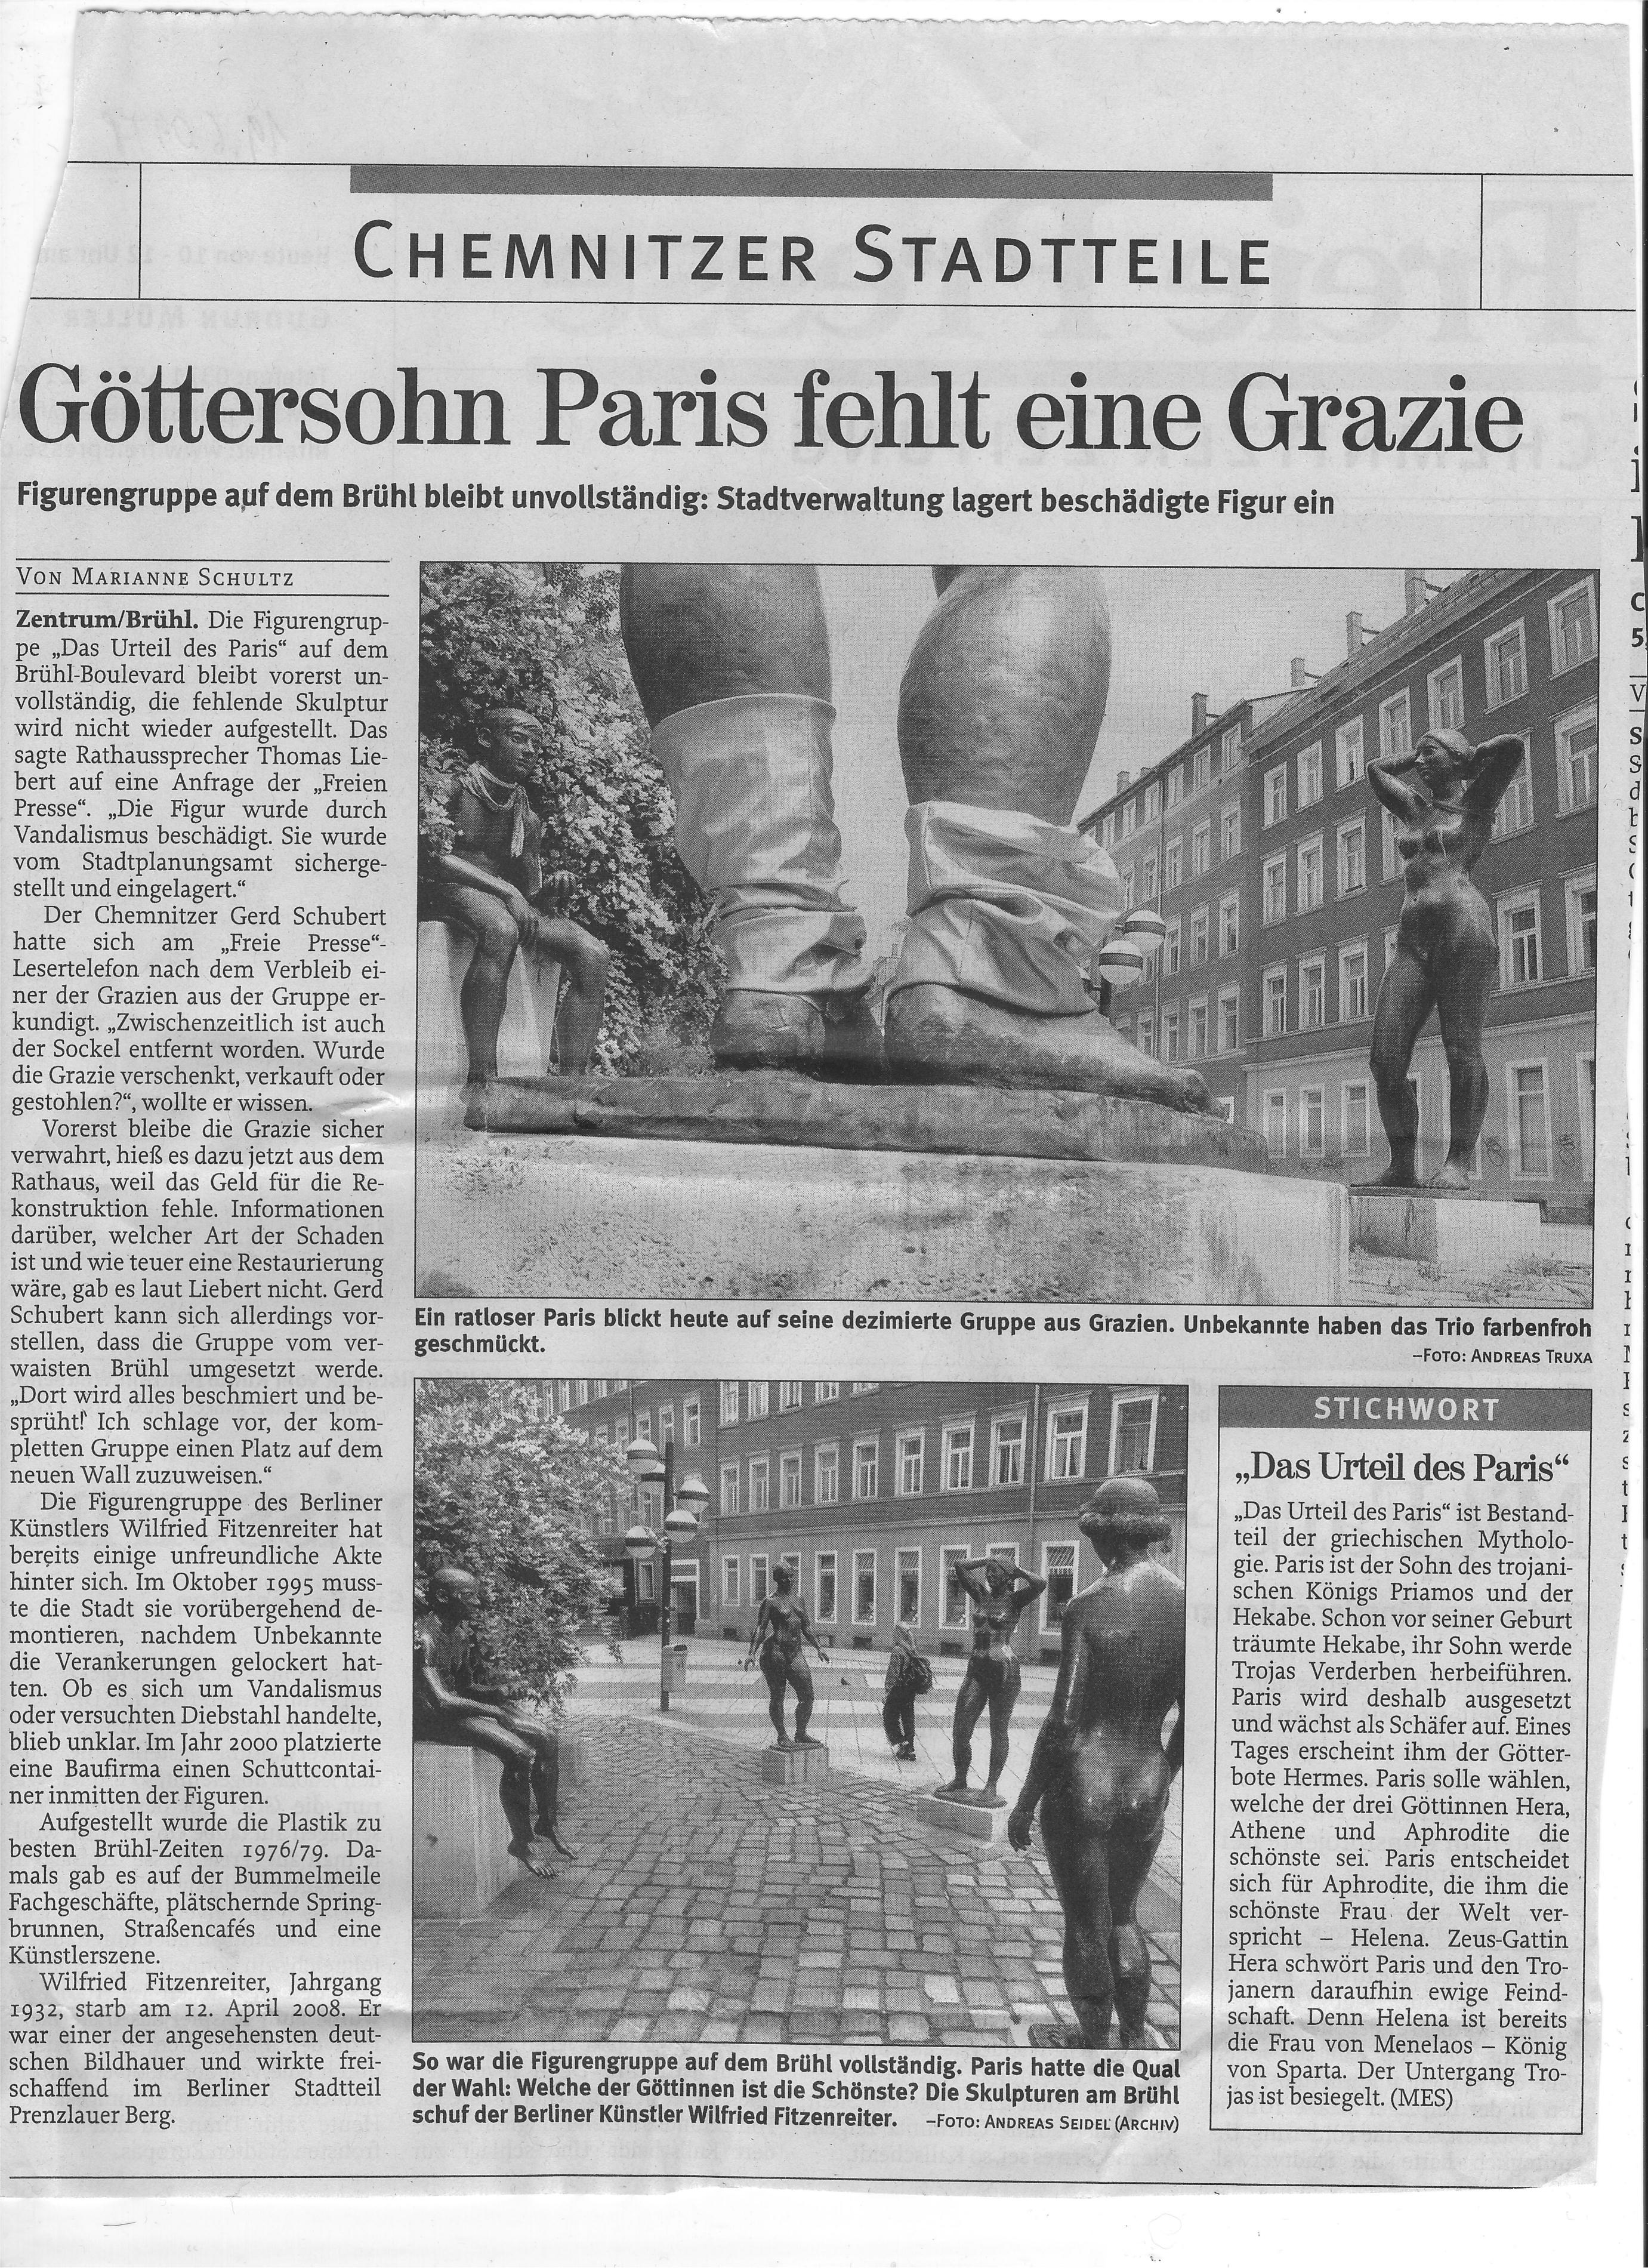 Freie Presse Chemnitz 19.06.09